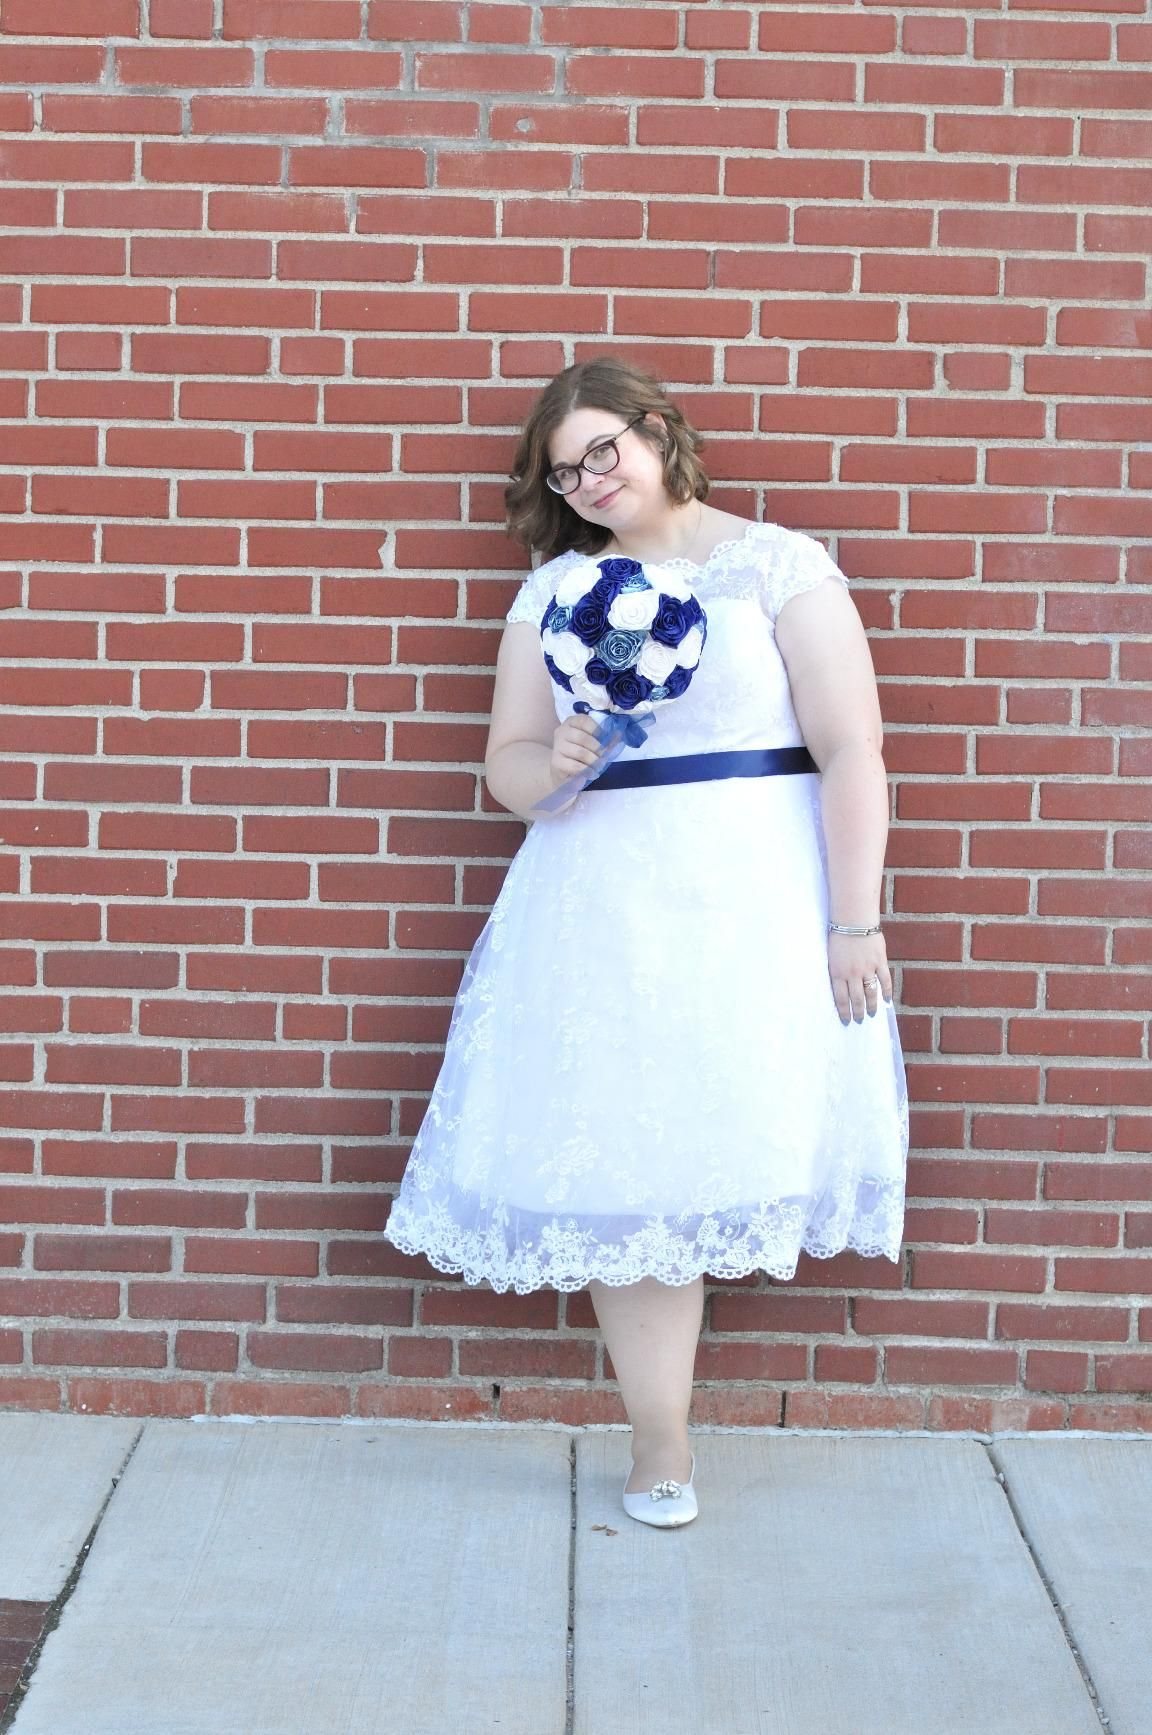 Best Plus Size Wedding Gown Amazon Review Short Wedding Gowns Short Wedding Dress Wedding Dress Blog [ 1735 x 1152 Pixel ]